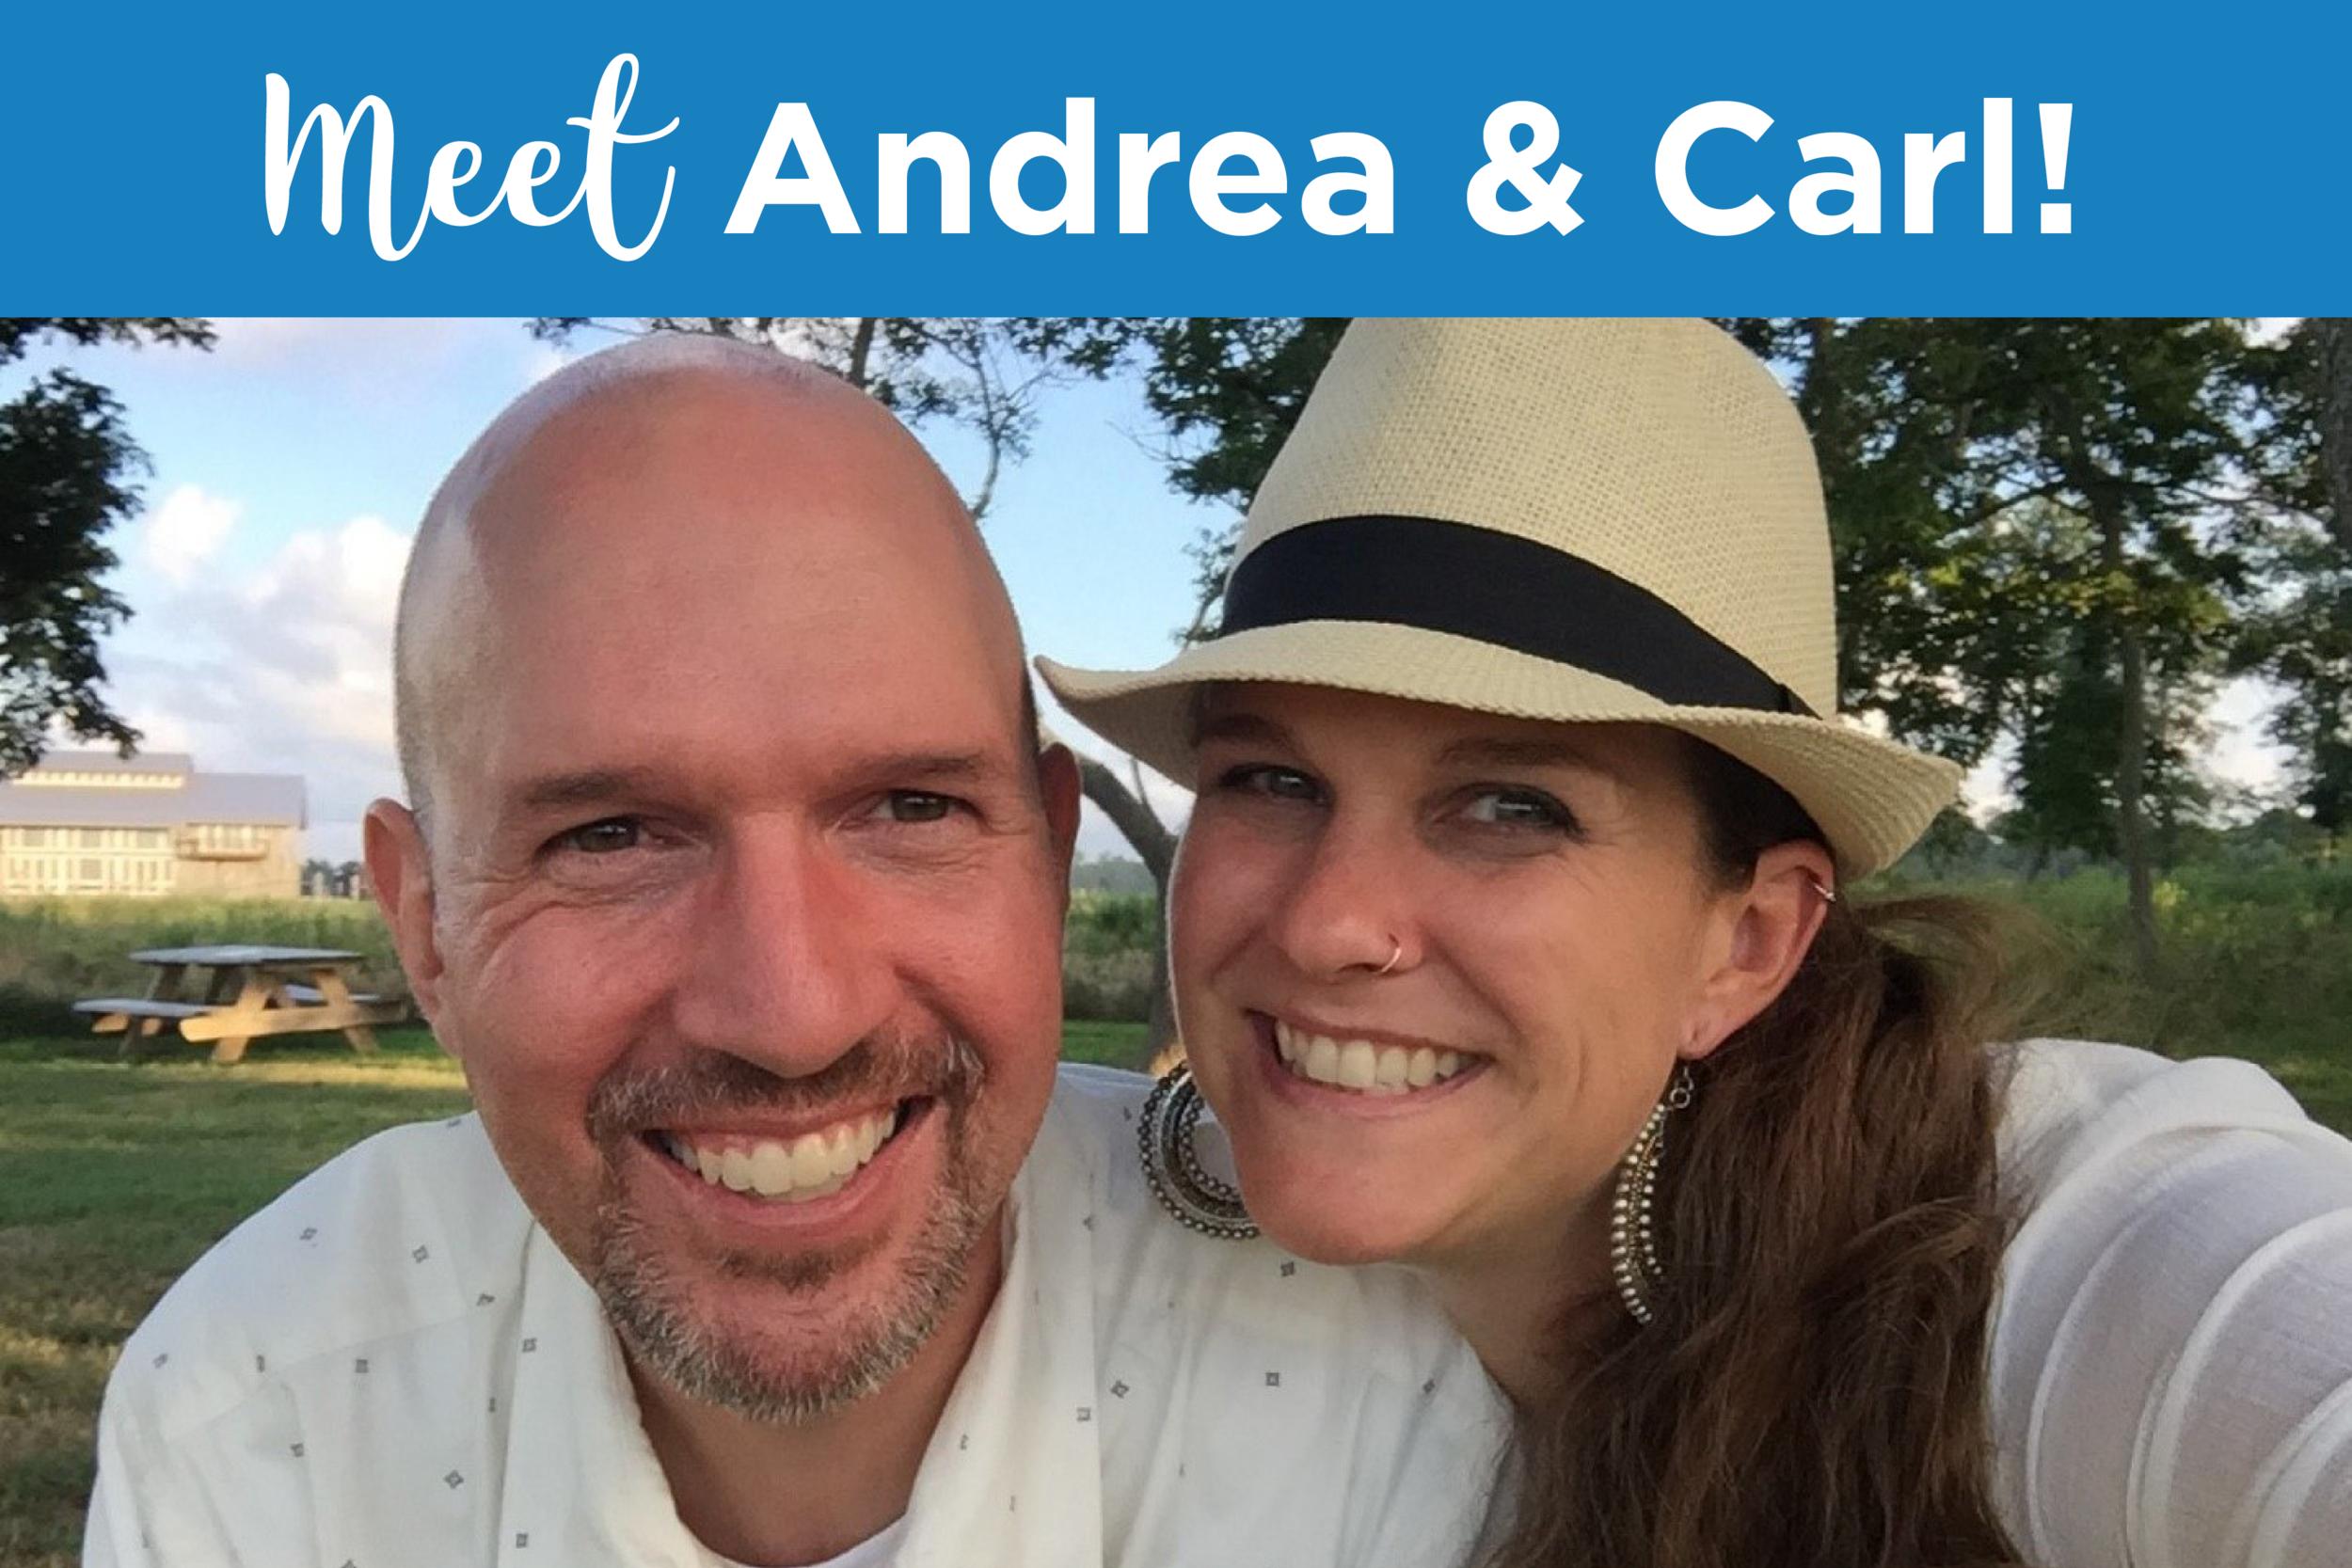 MeetAndreaCarl-2019.png